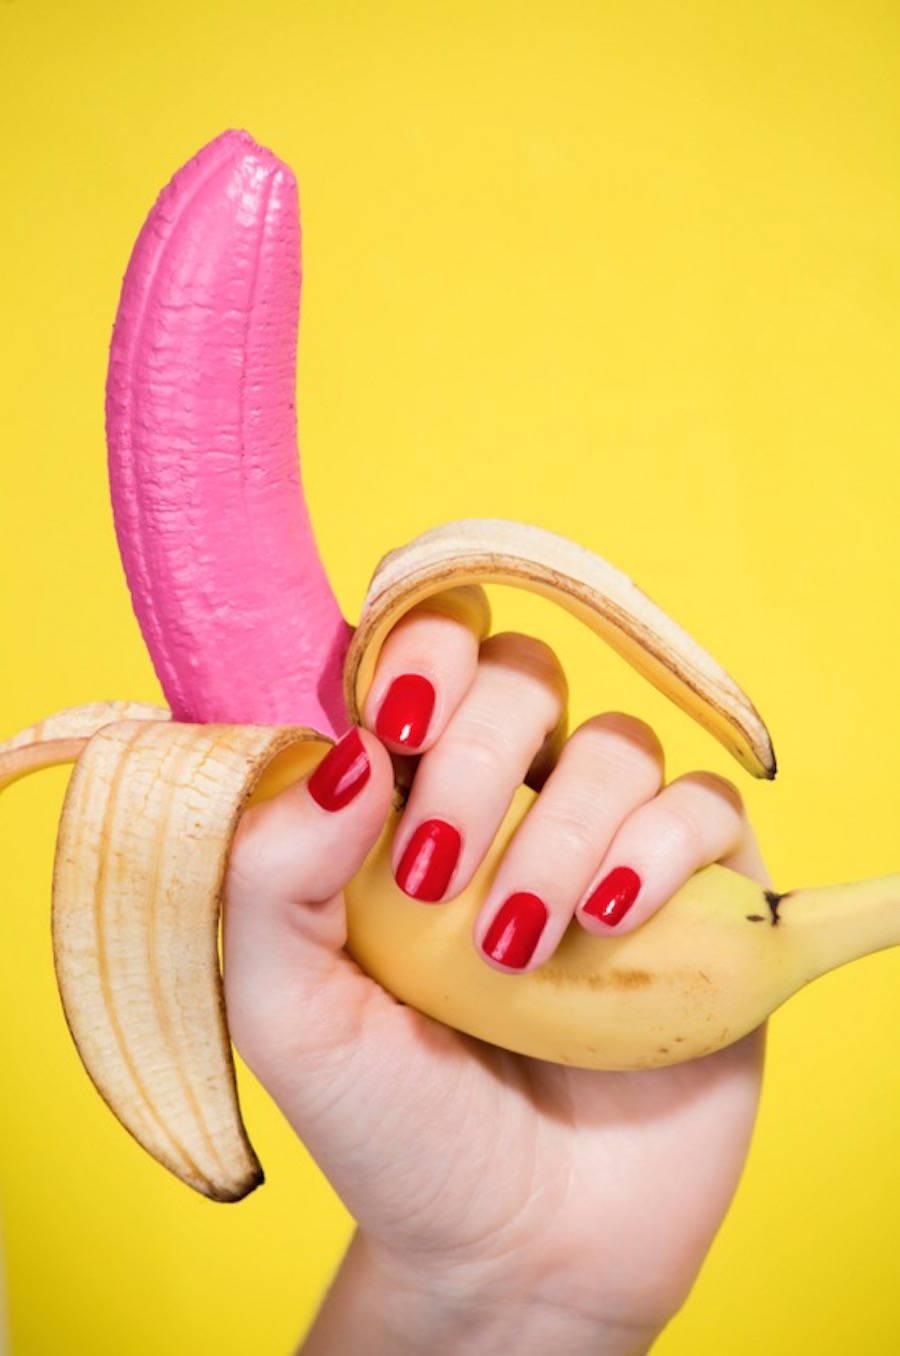 las fotografías coloristas de aleksandra kingo molan. plátano rosa